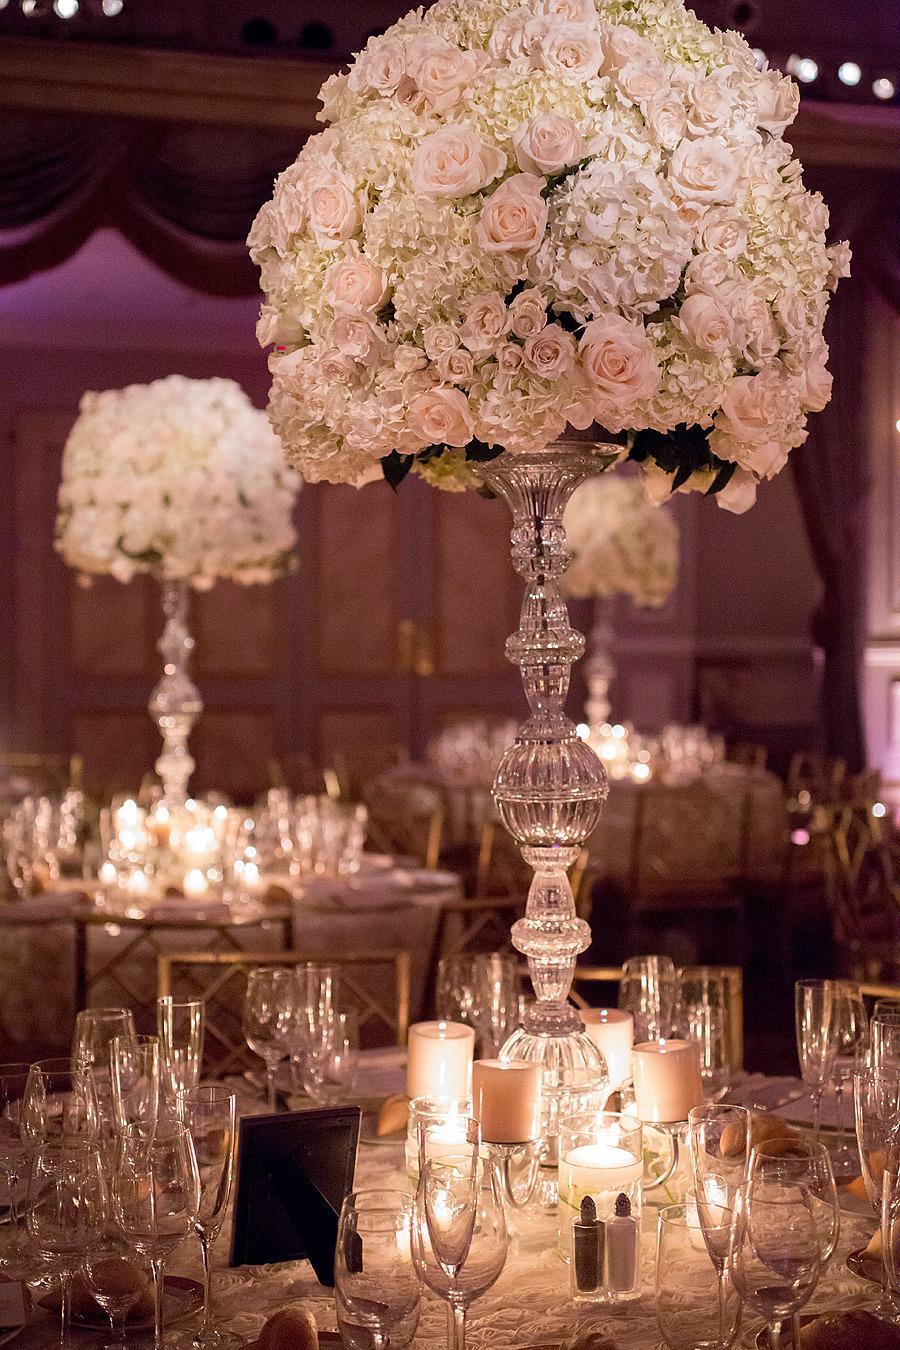 Elegant wedding centerpieces - Elegant Wedding Centerpieces